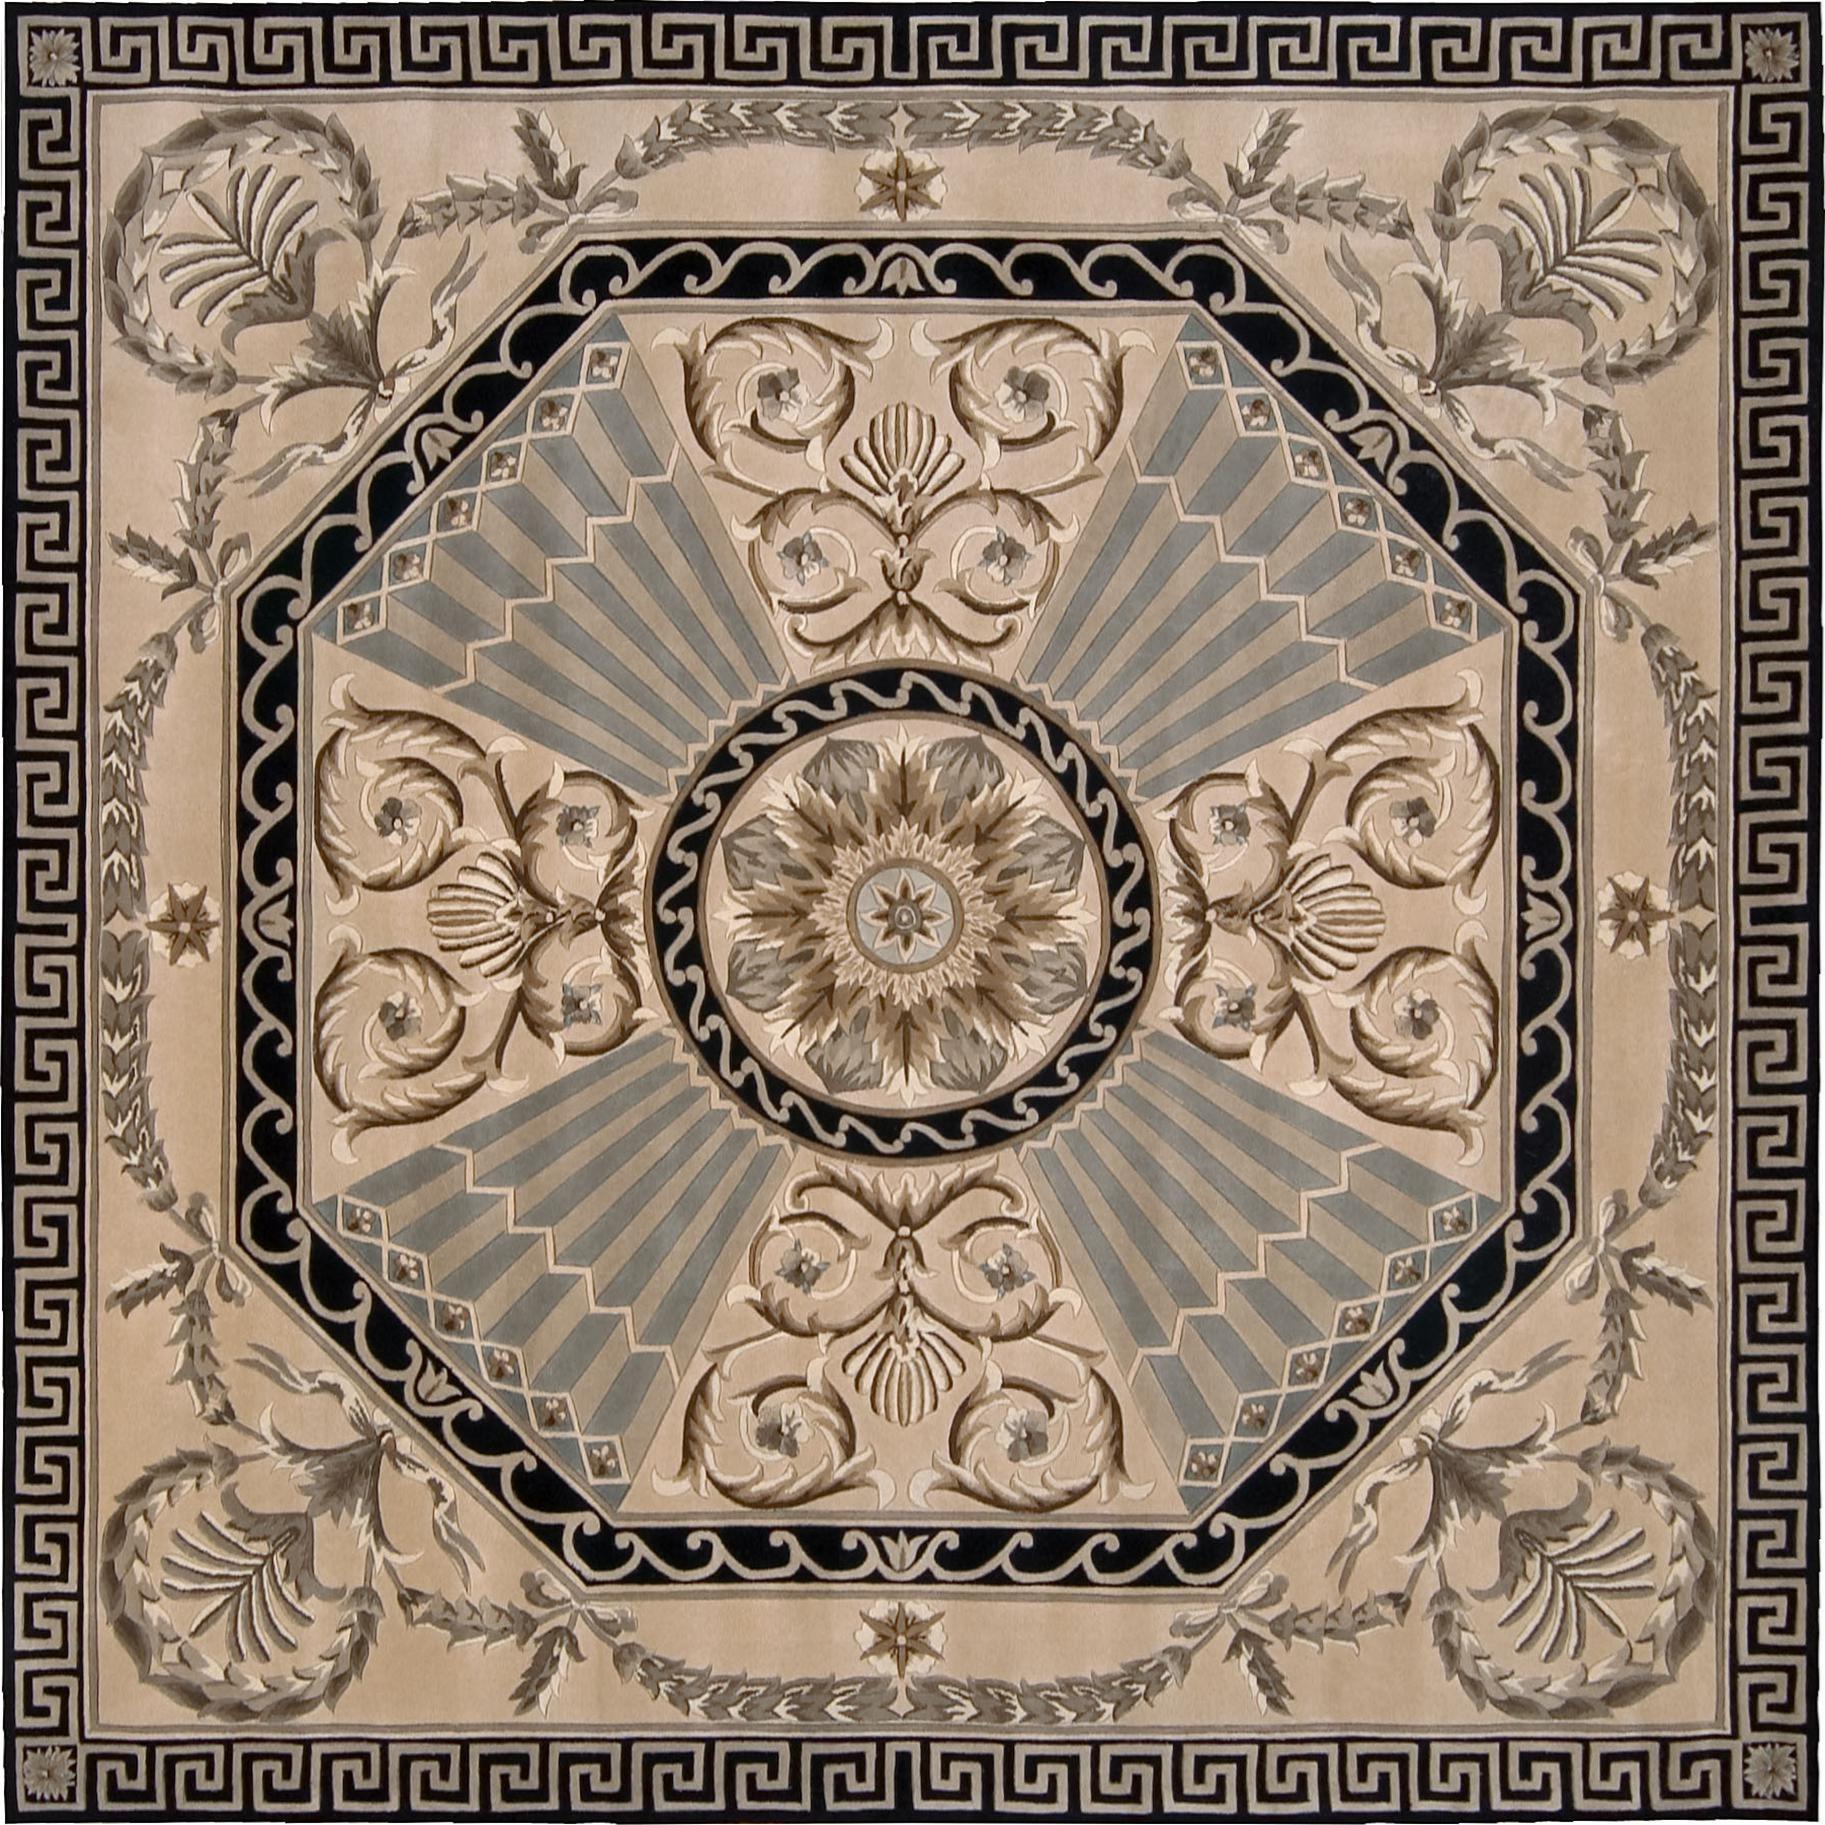 Nourison Versailles Palace 8' x 8' Beige Area Rug - Item Number: 78101